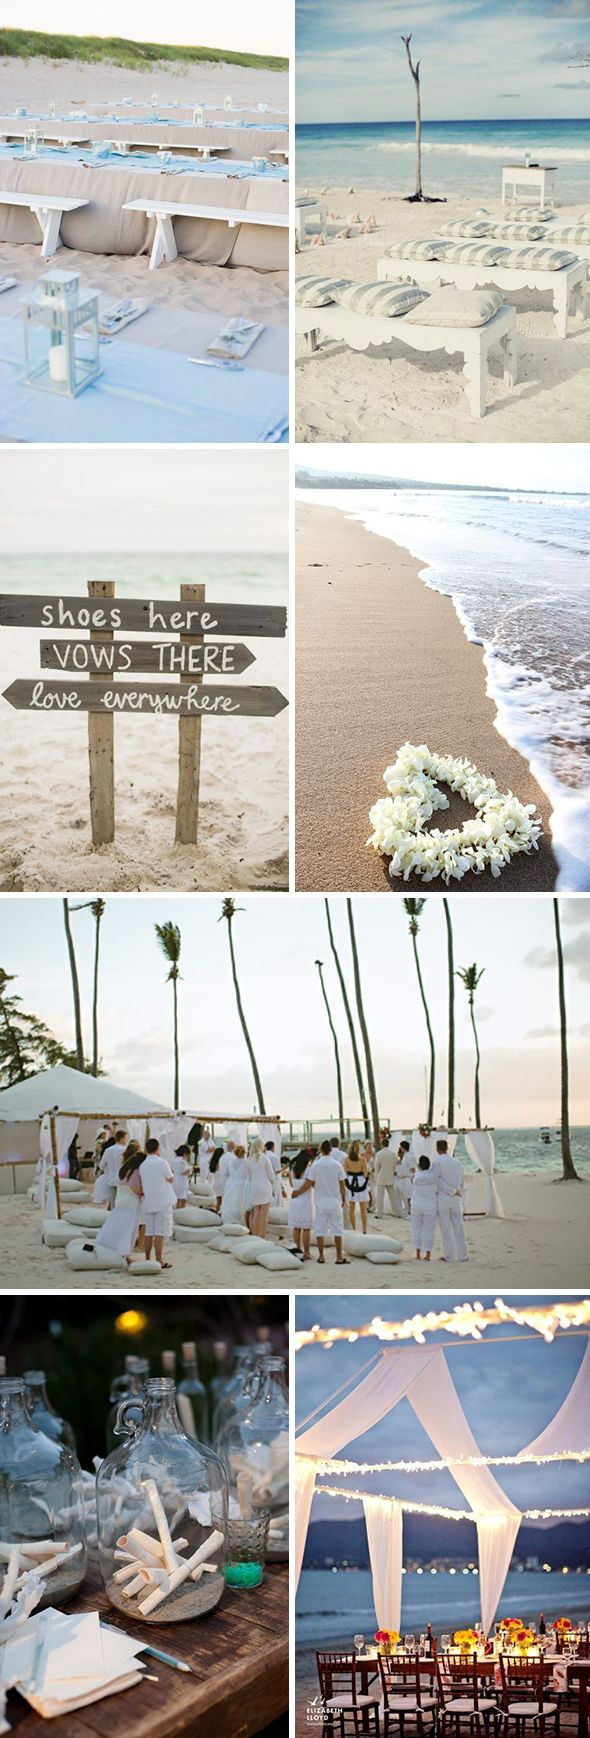 Simple Beach Wedding Ideas | The Destination Wedding Blog - Jet Fete by Bridal Bar  bottom tent